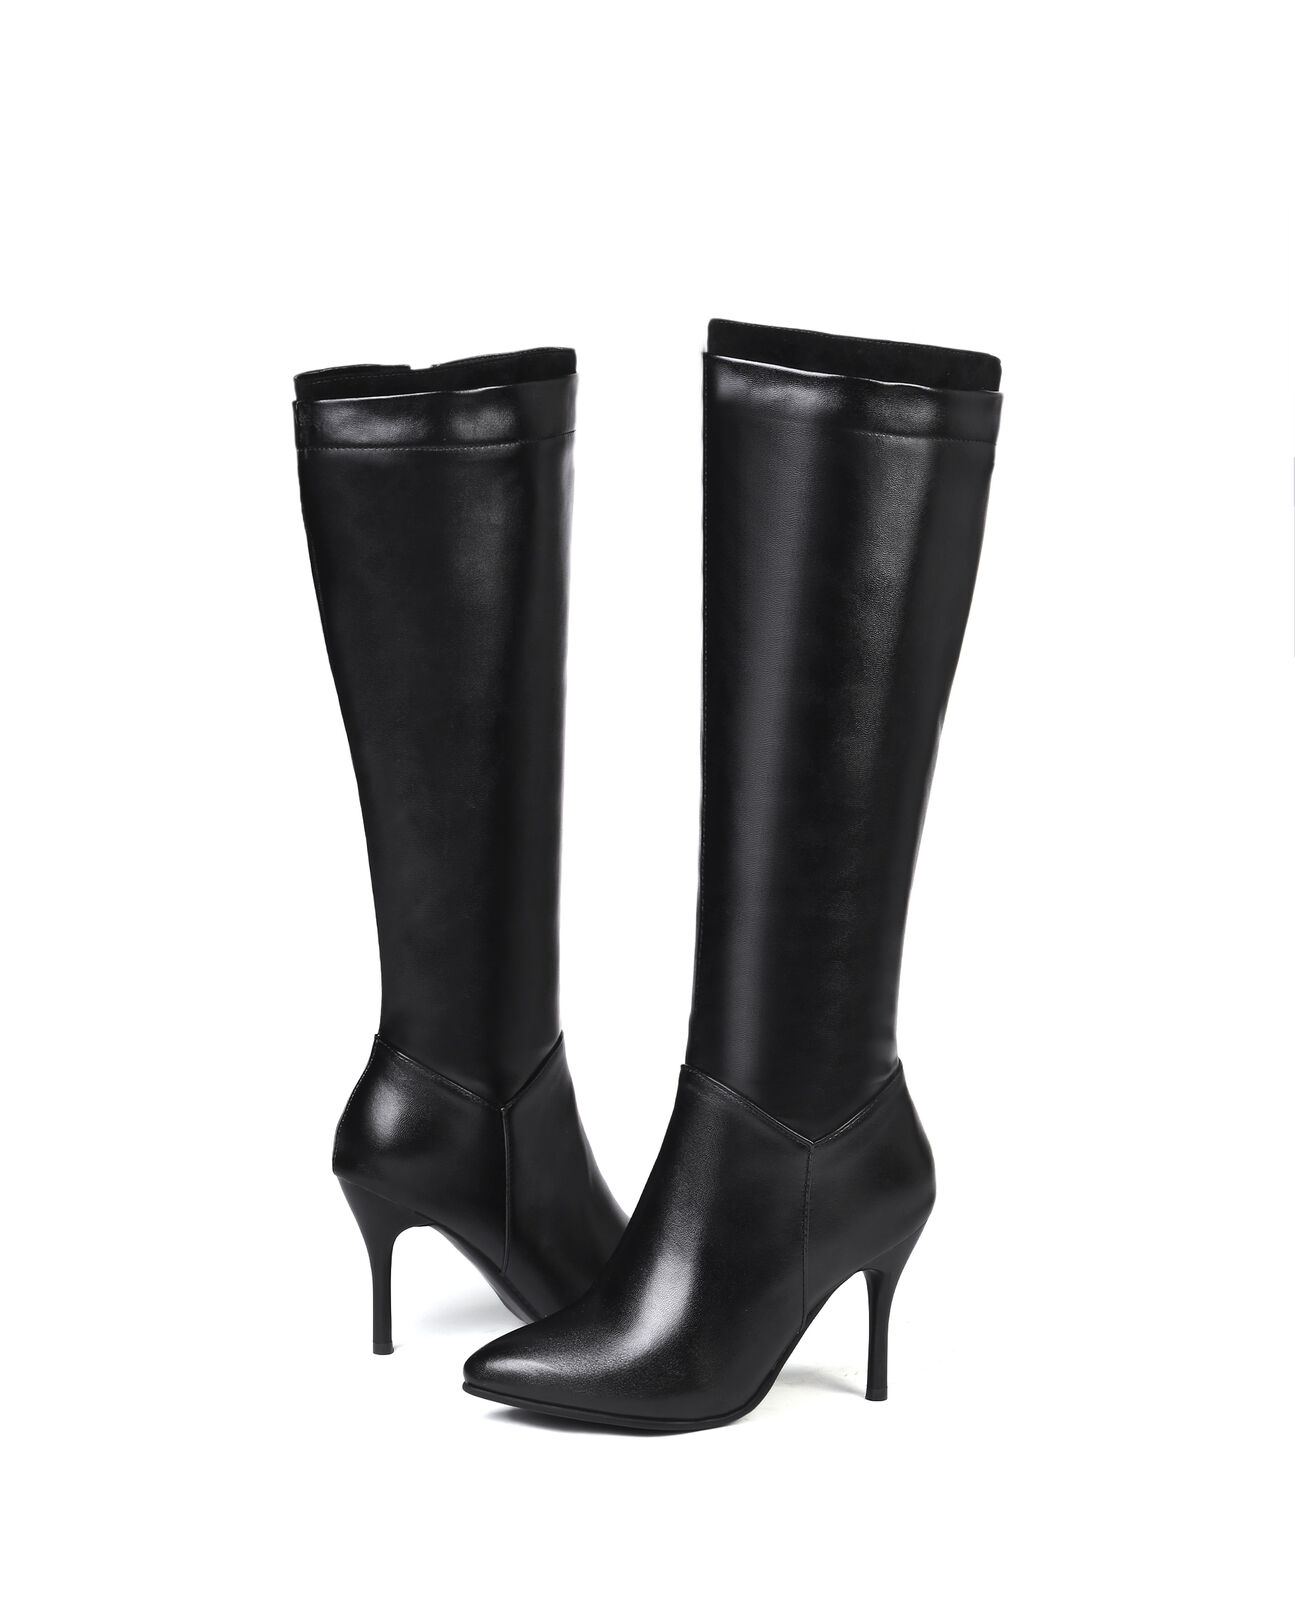 Mode Stiefel Damenschuhe Spitz HIgh zehe Lackleder Kneehohe Stiefel Sexy HIgh Spitz Heel 4b79cc